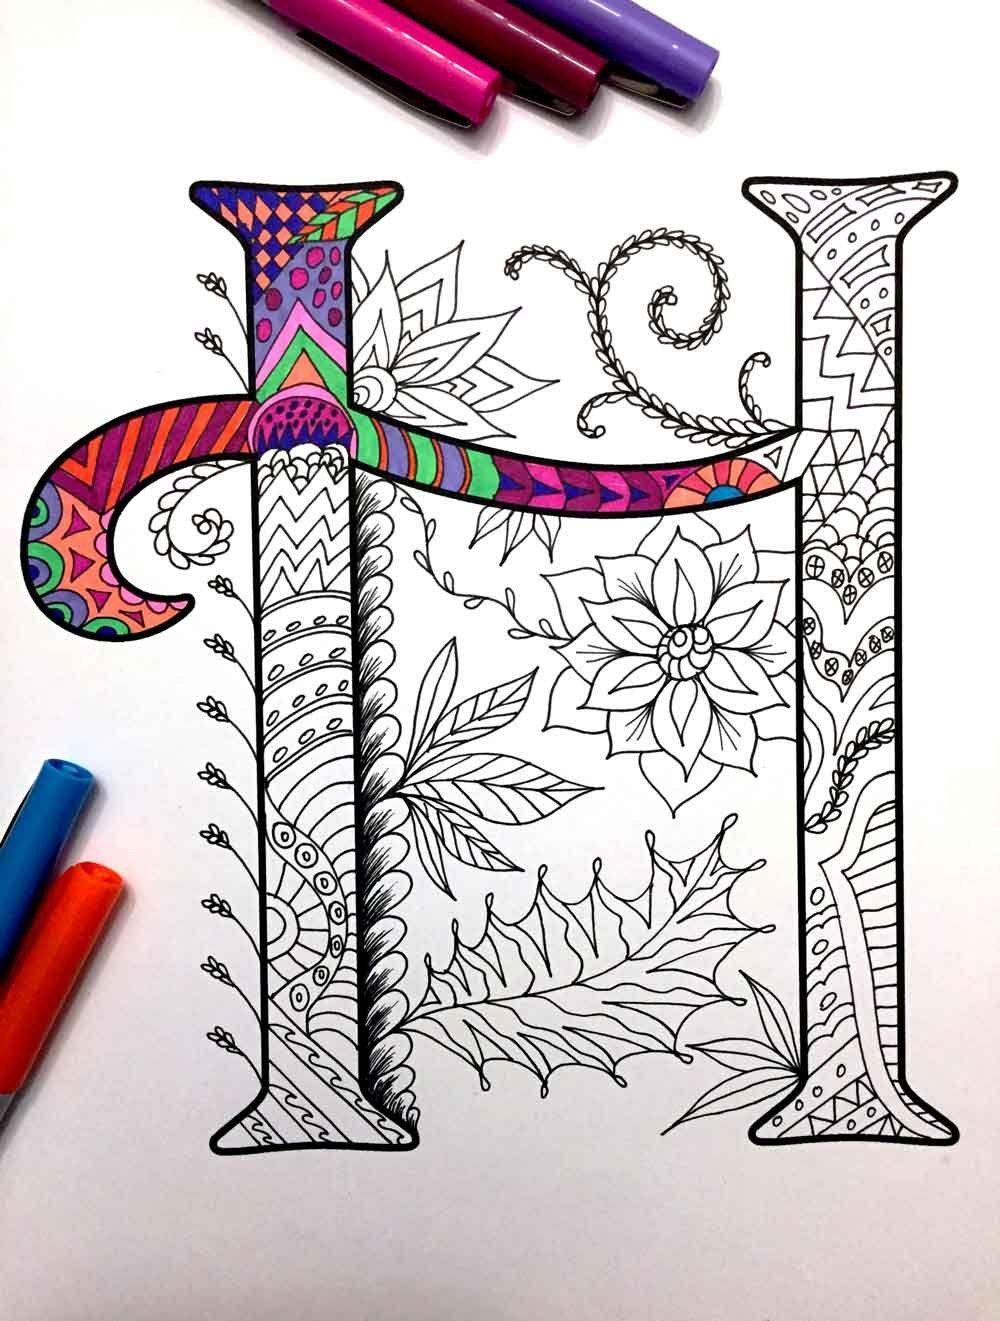 Harrington Font Printable Zentangle Alphabet Number Coloring Pages Zentangle Art Lettering Alphabet Coloring Books